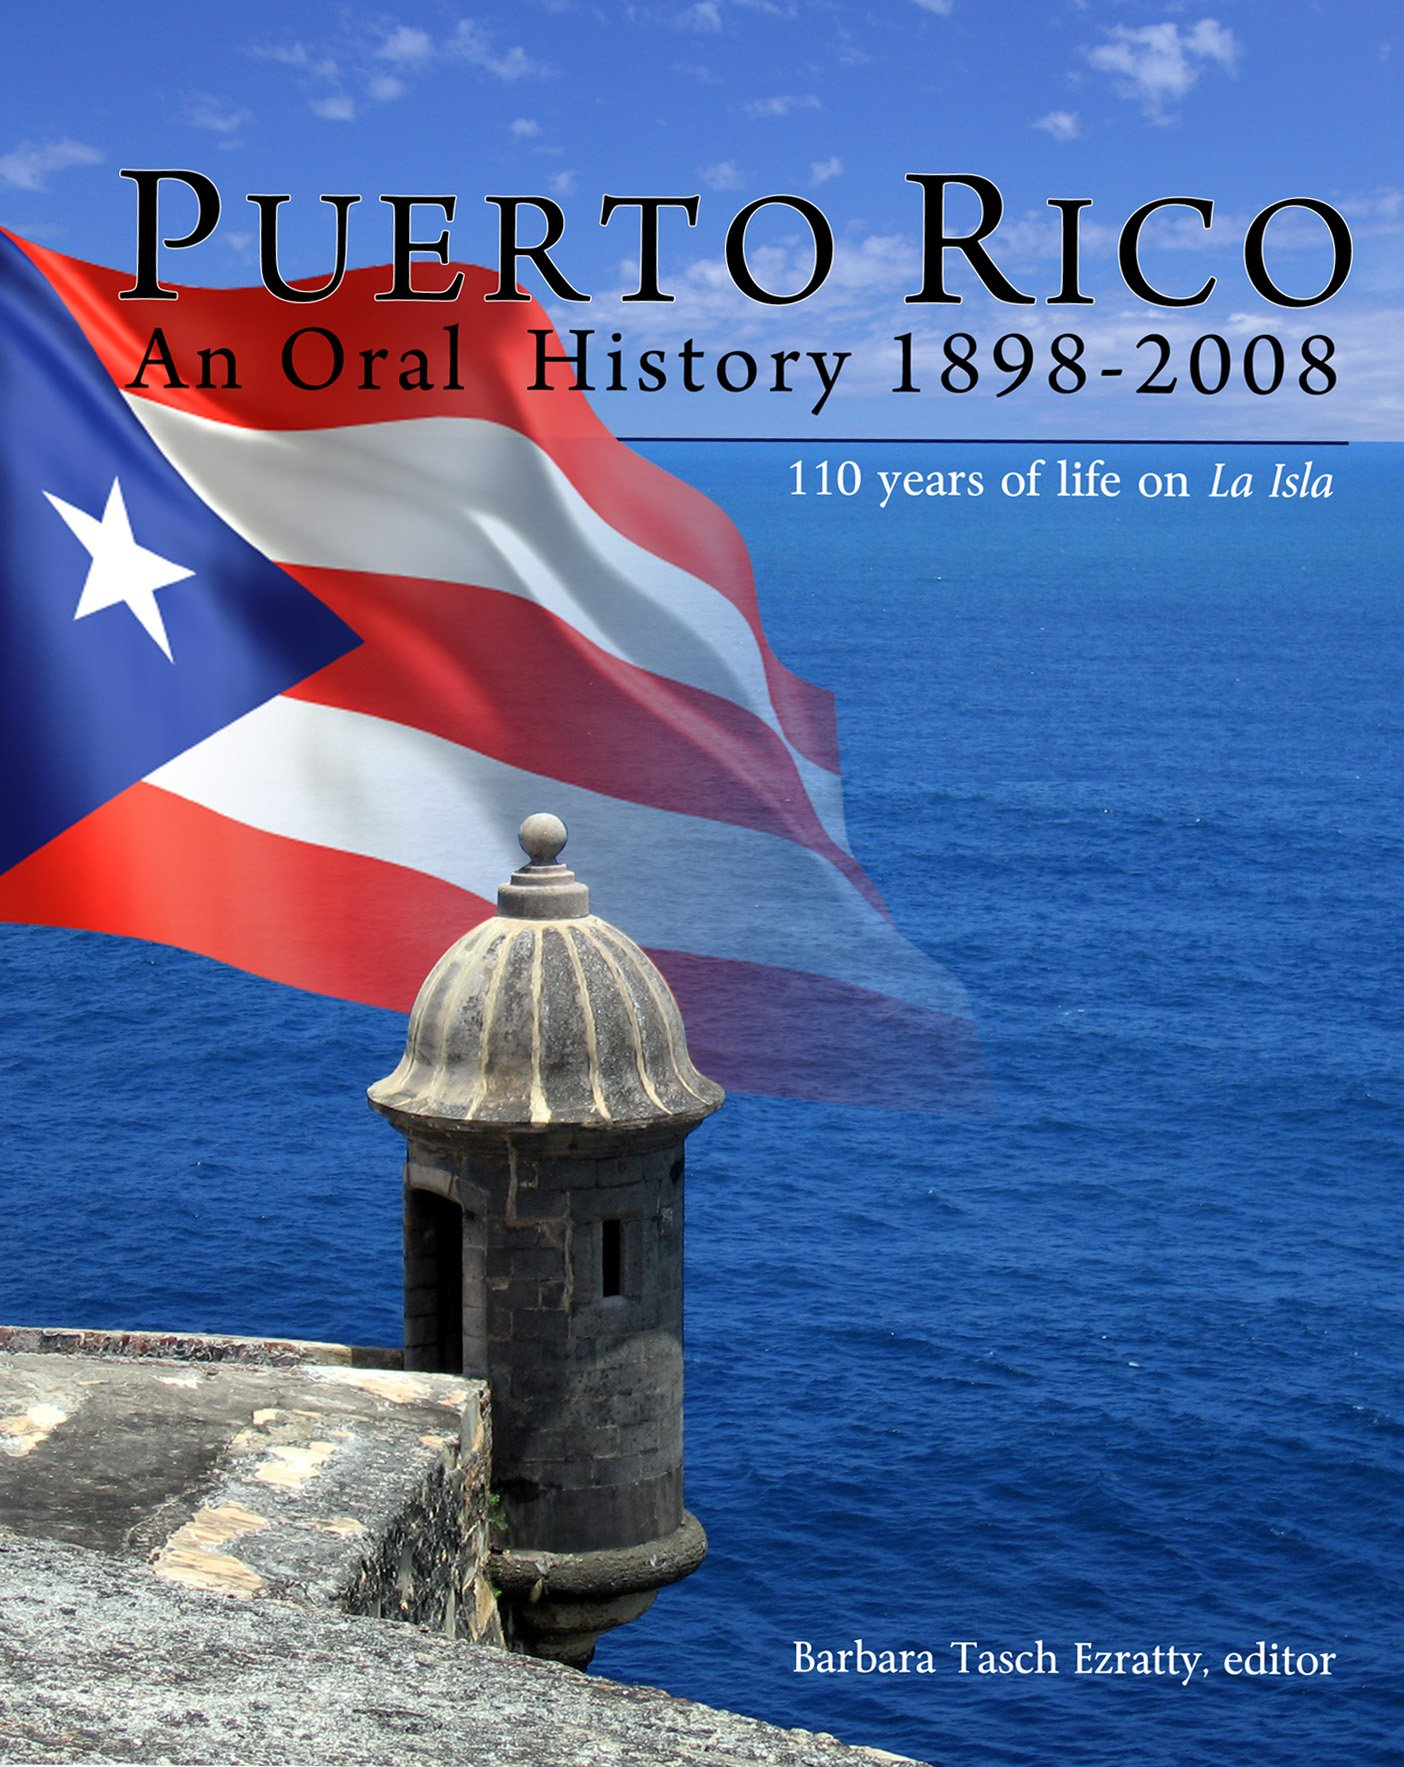 Puerto Rico An Oral History 1898-2008 PDF